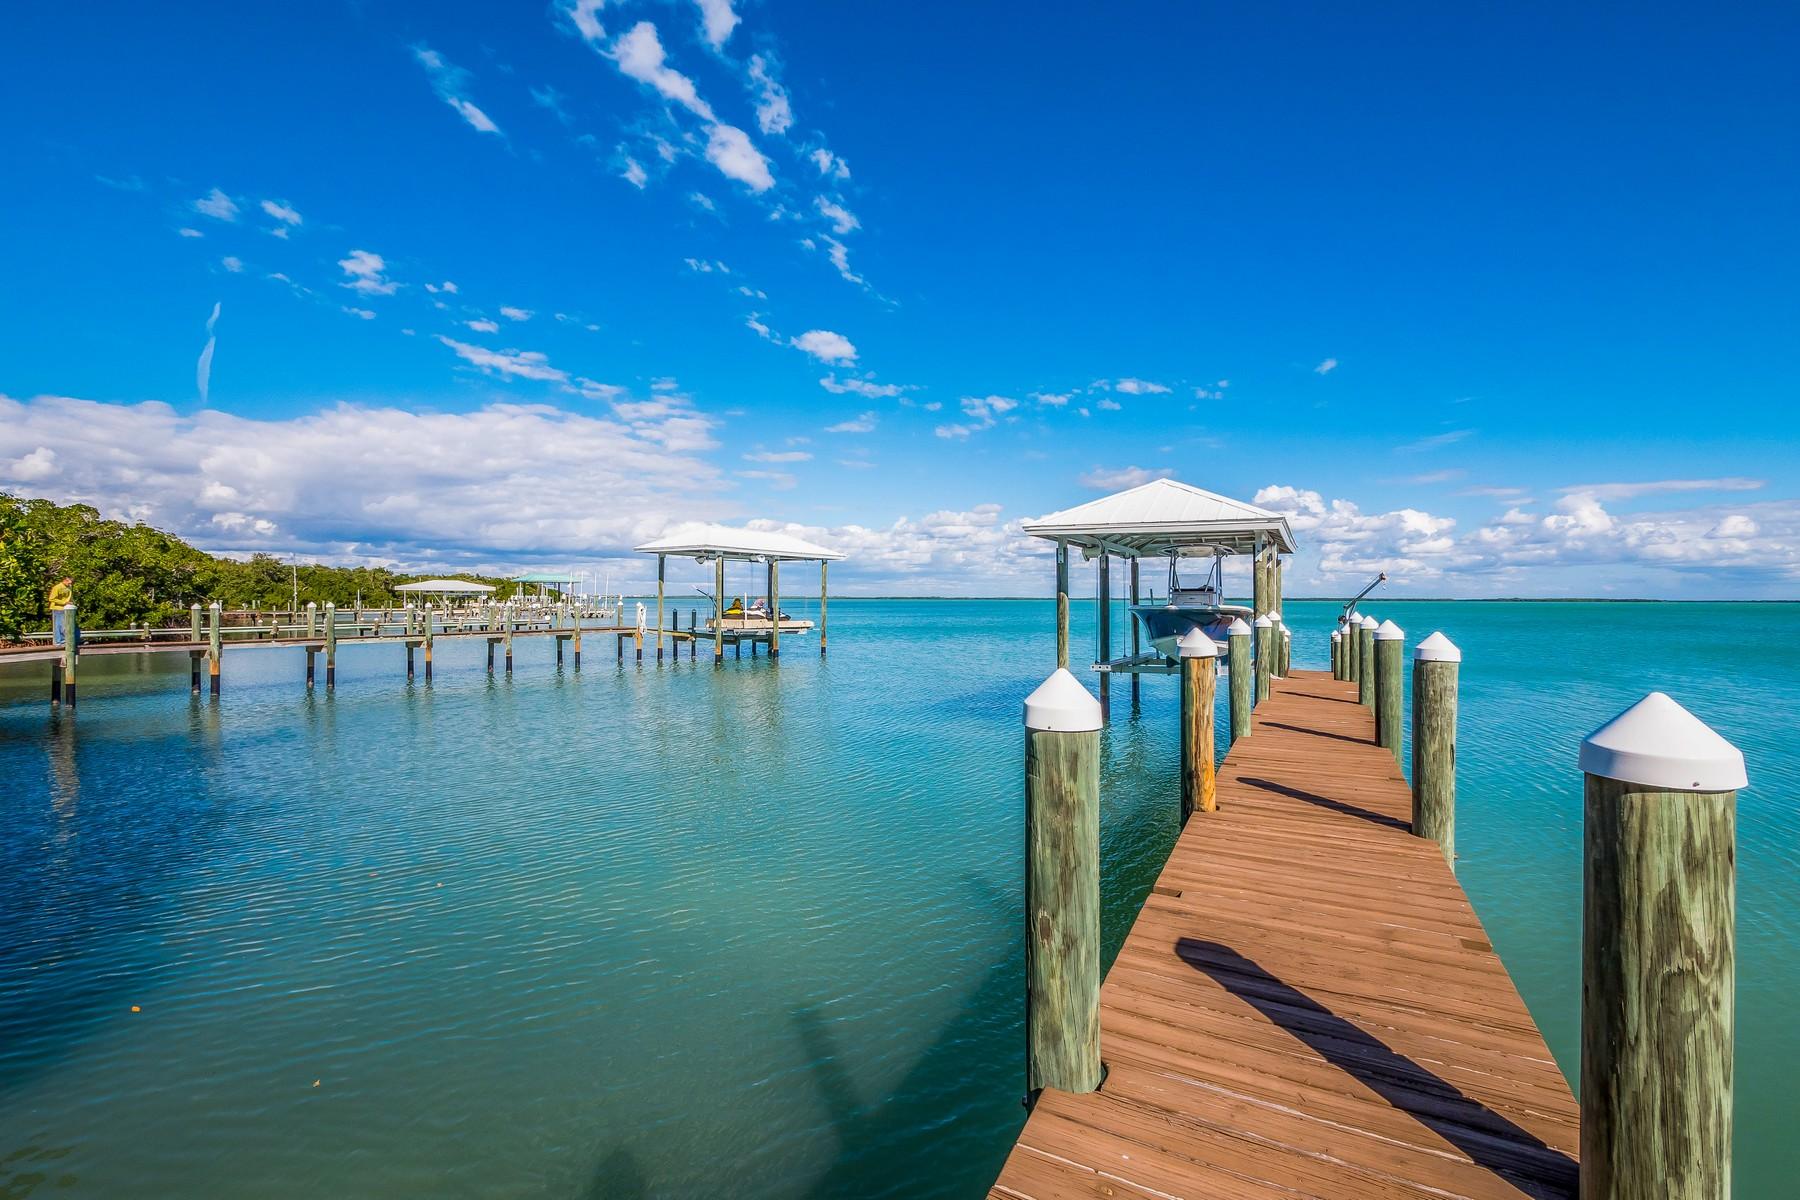 Single Family Home for Rent at 9 Peekins Cove 9 Peekins Cove Boca Grande, Florida 33921 United States